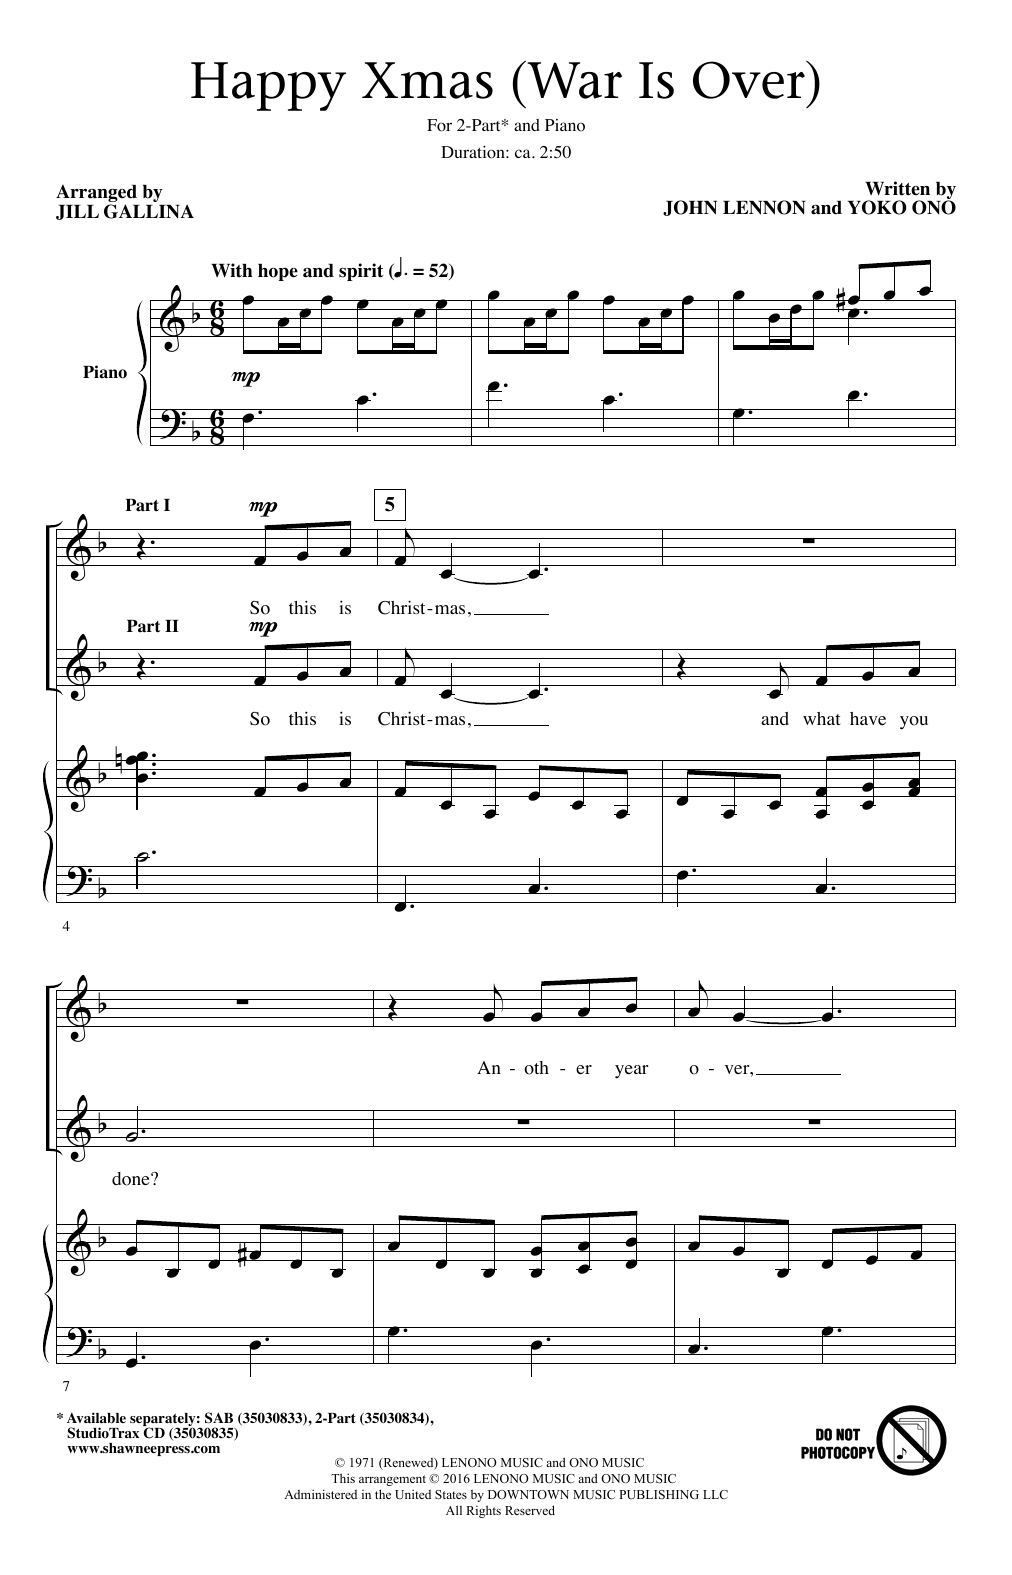 Happy Xmas (War Is Over) (arr. Jill Gallina) Sheet Music